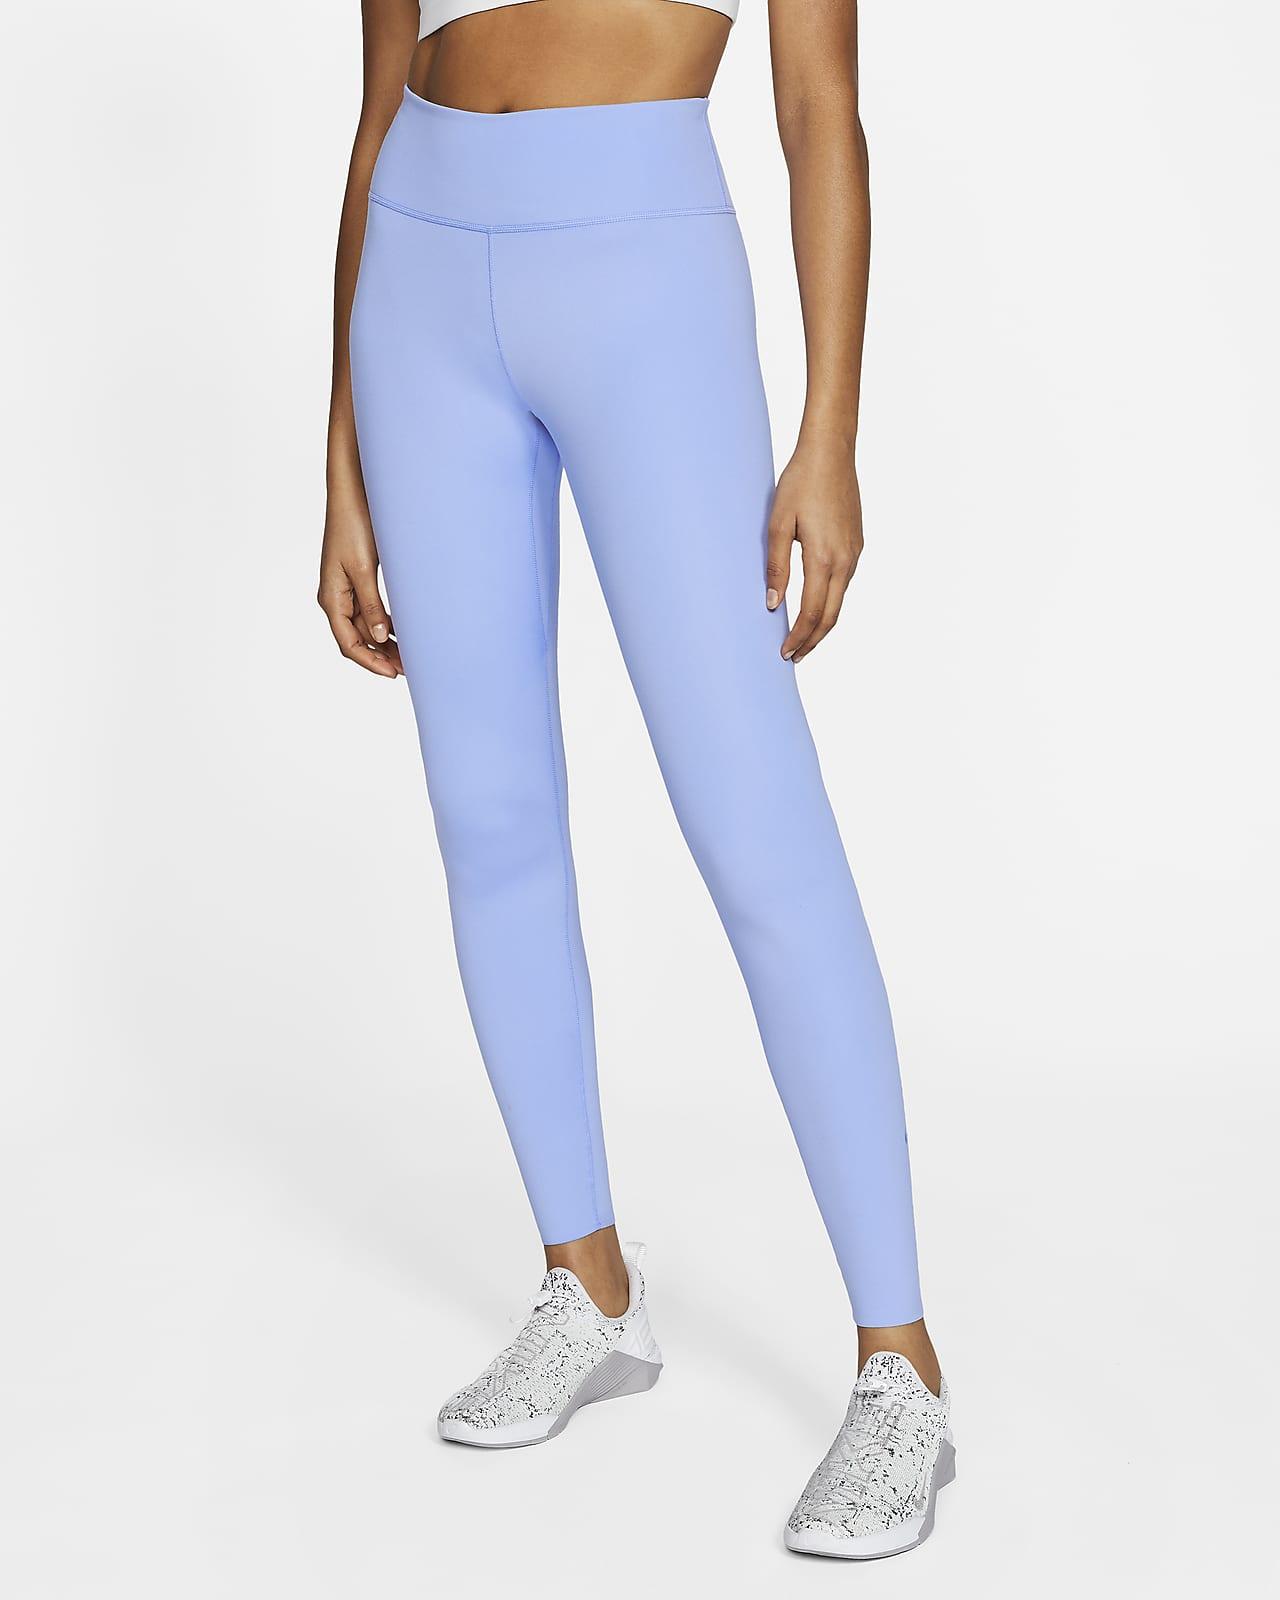 Nike One Luxe Malles amb cintura mitjana - Dona